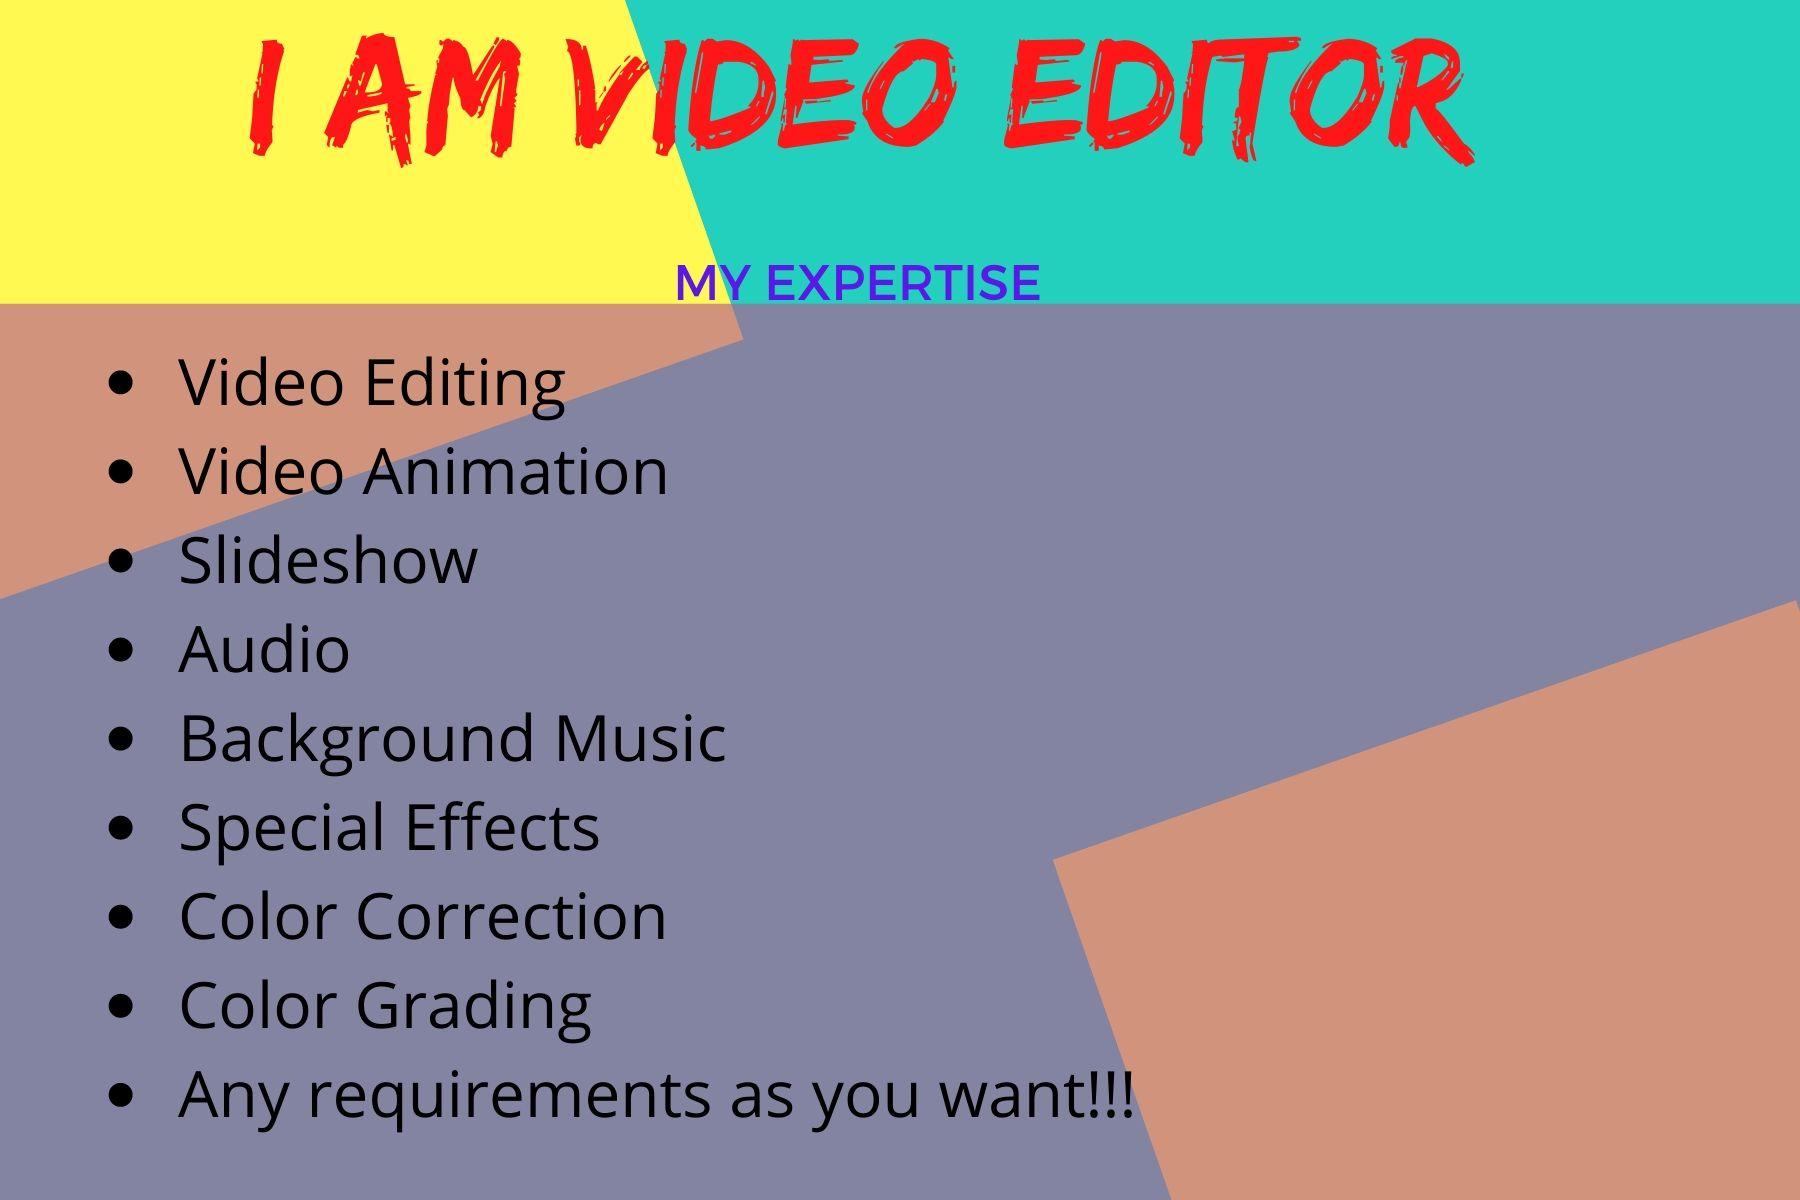 I am Professional Video Editor